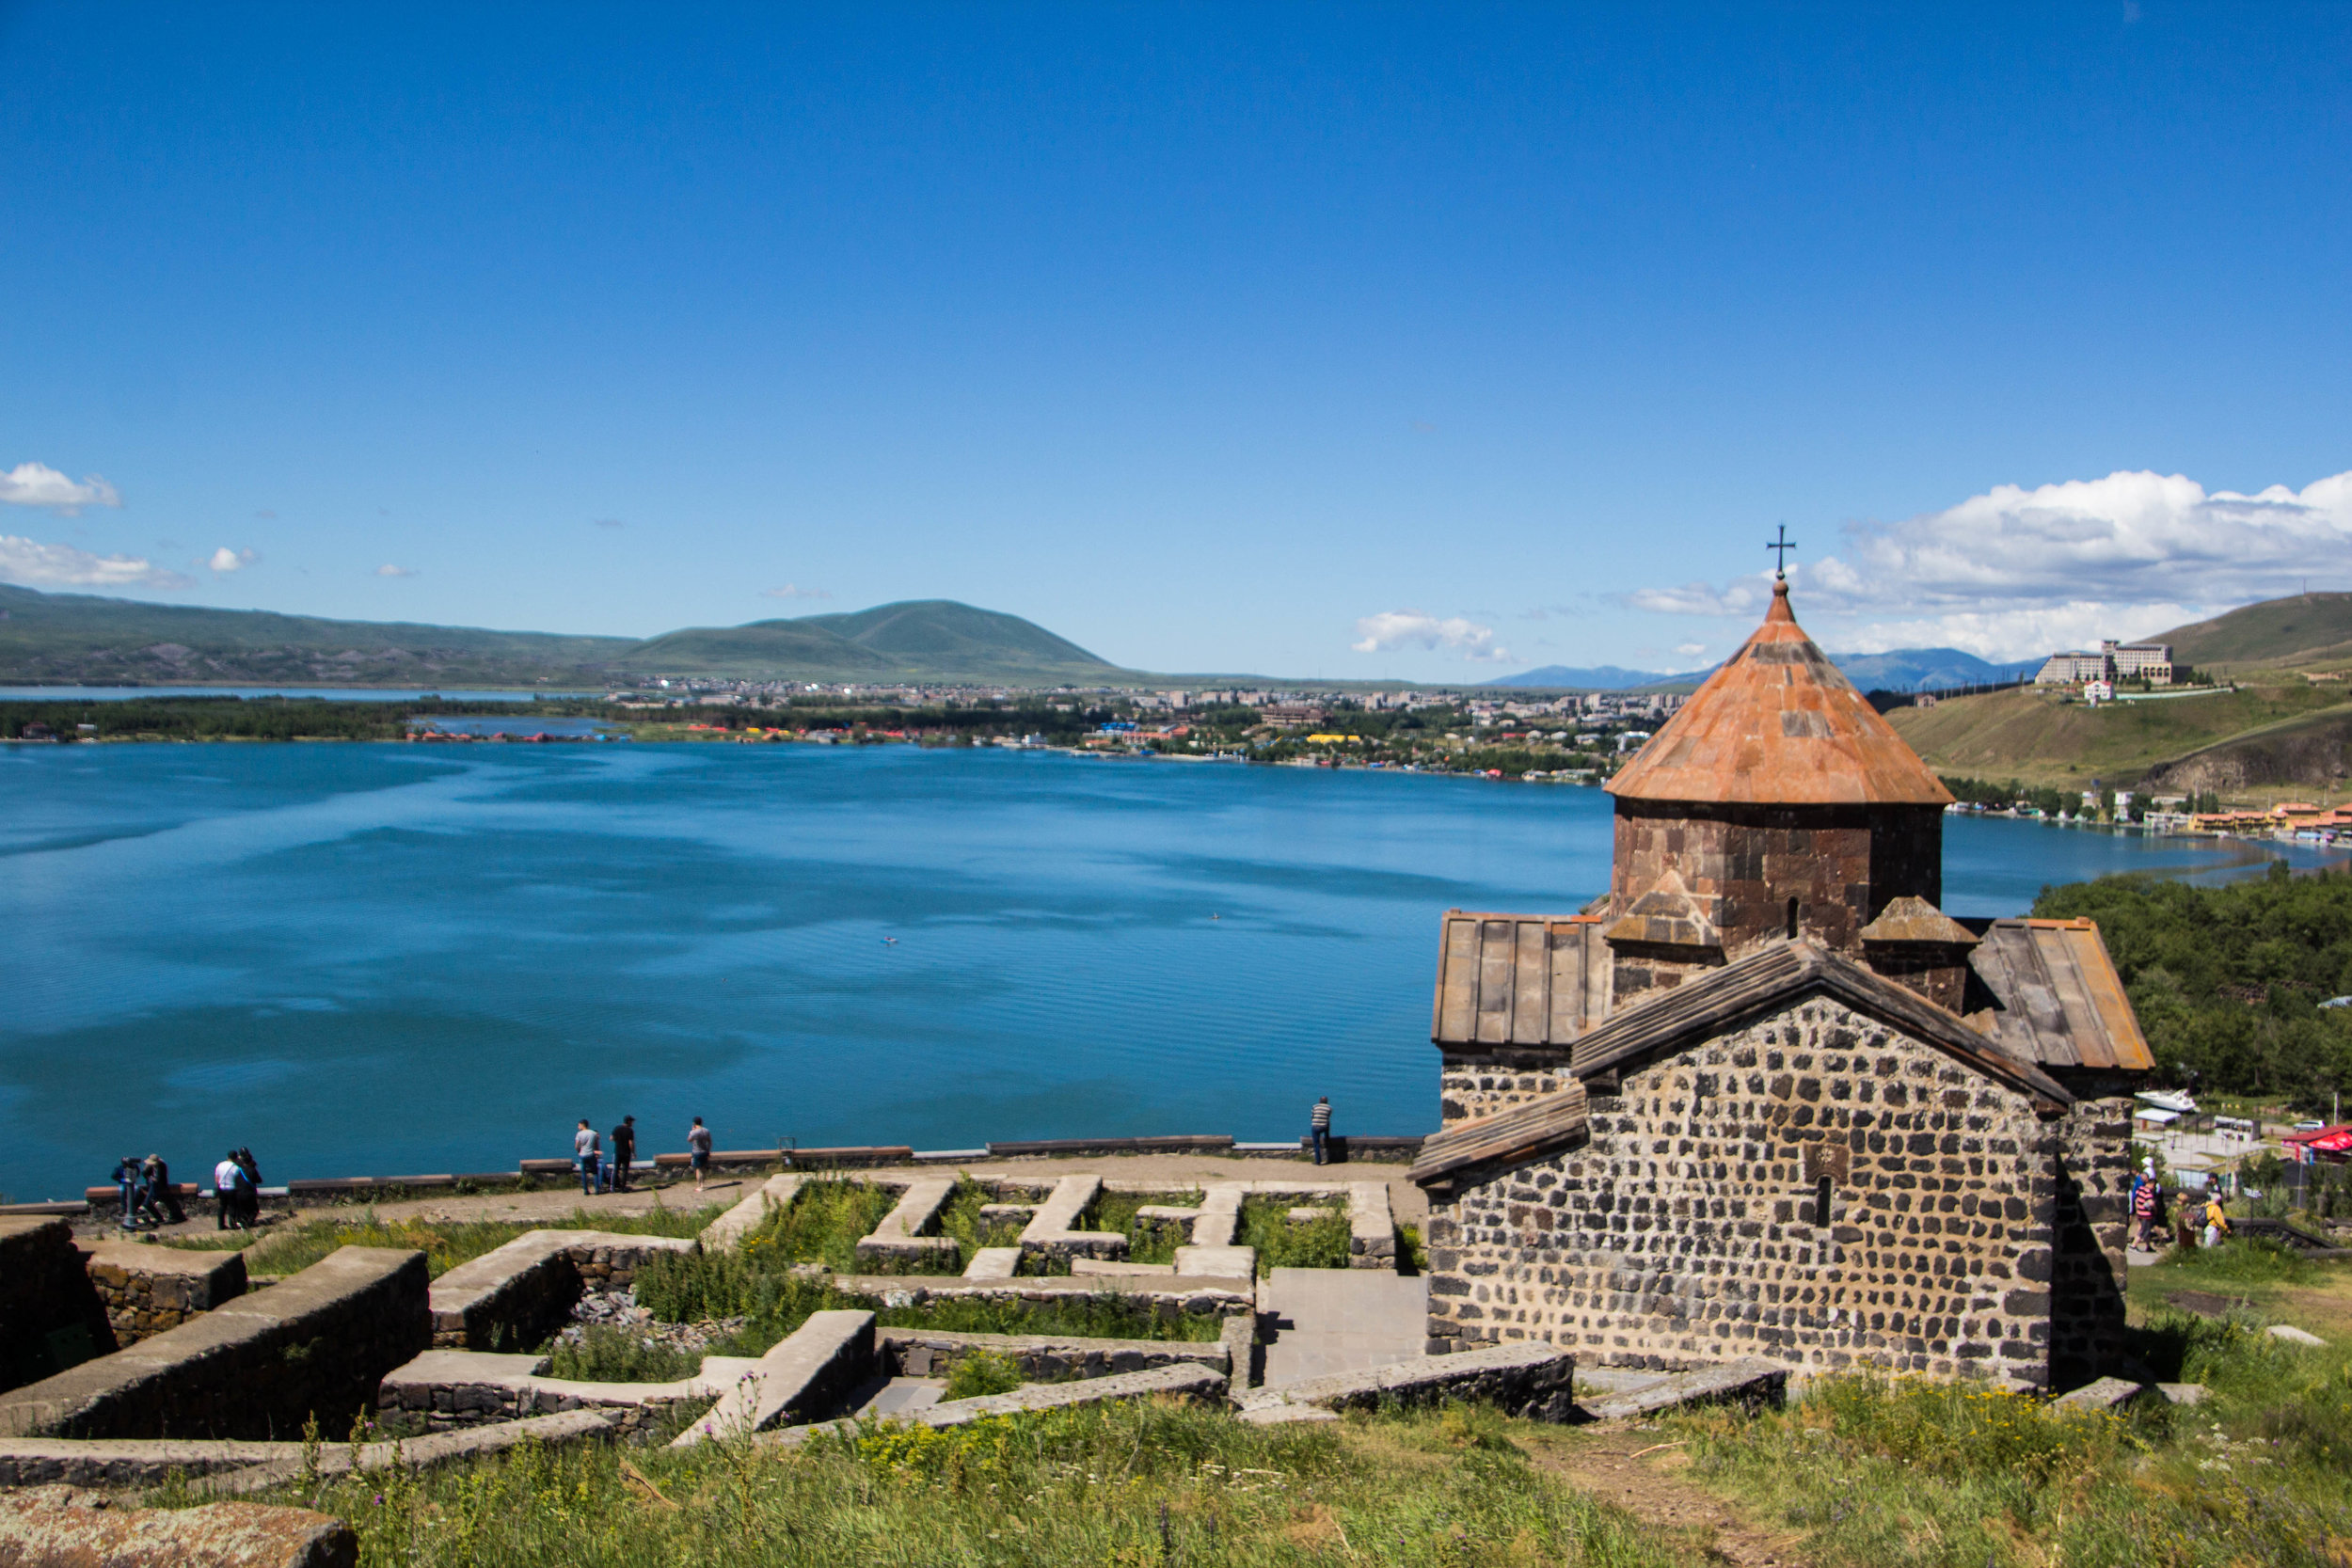 sevanavank-lake-sevan-armenia-18.jpg